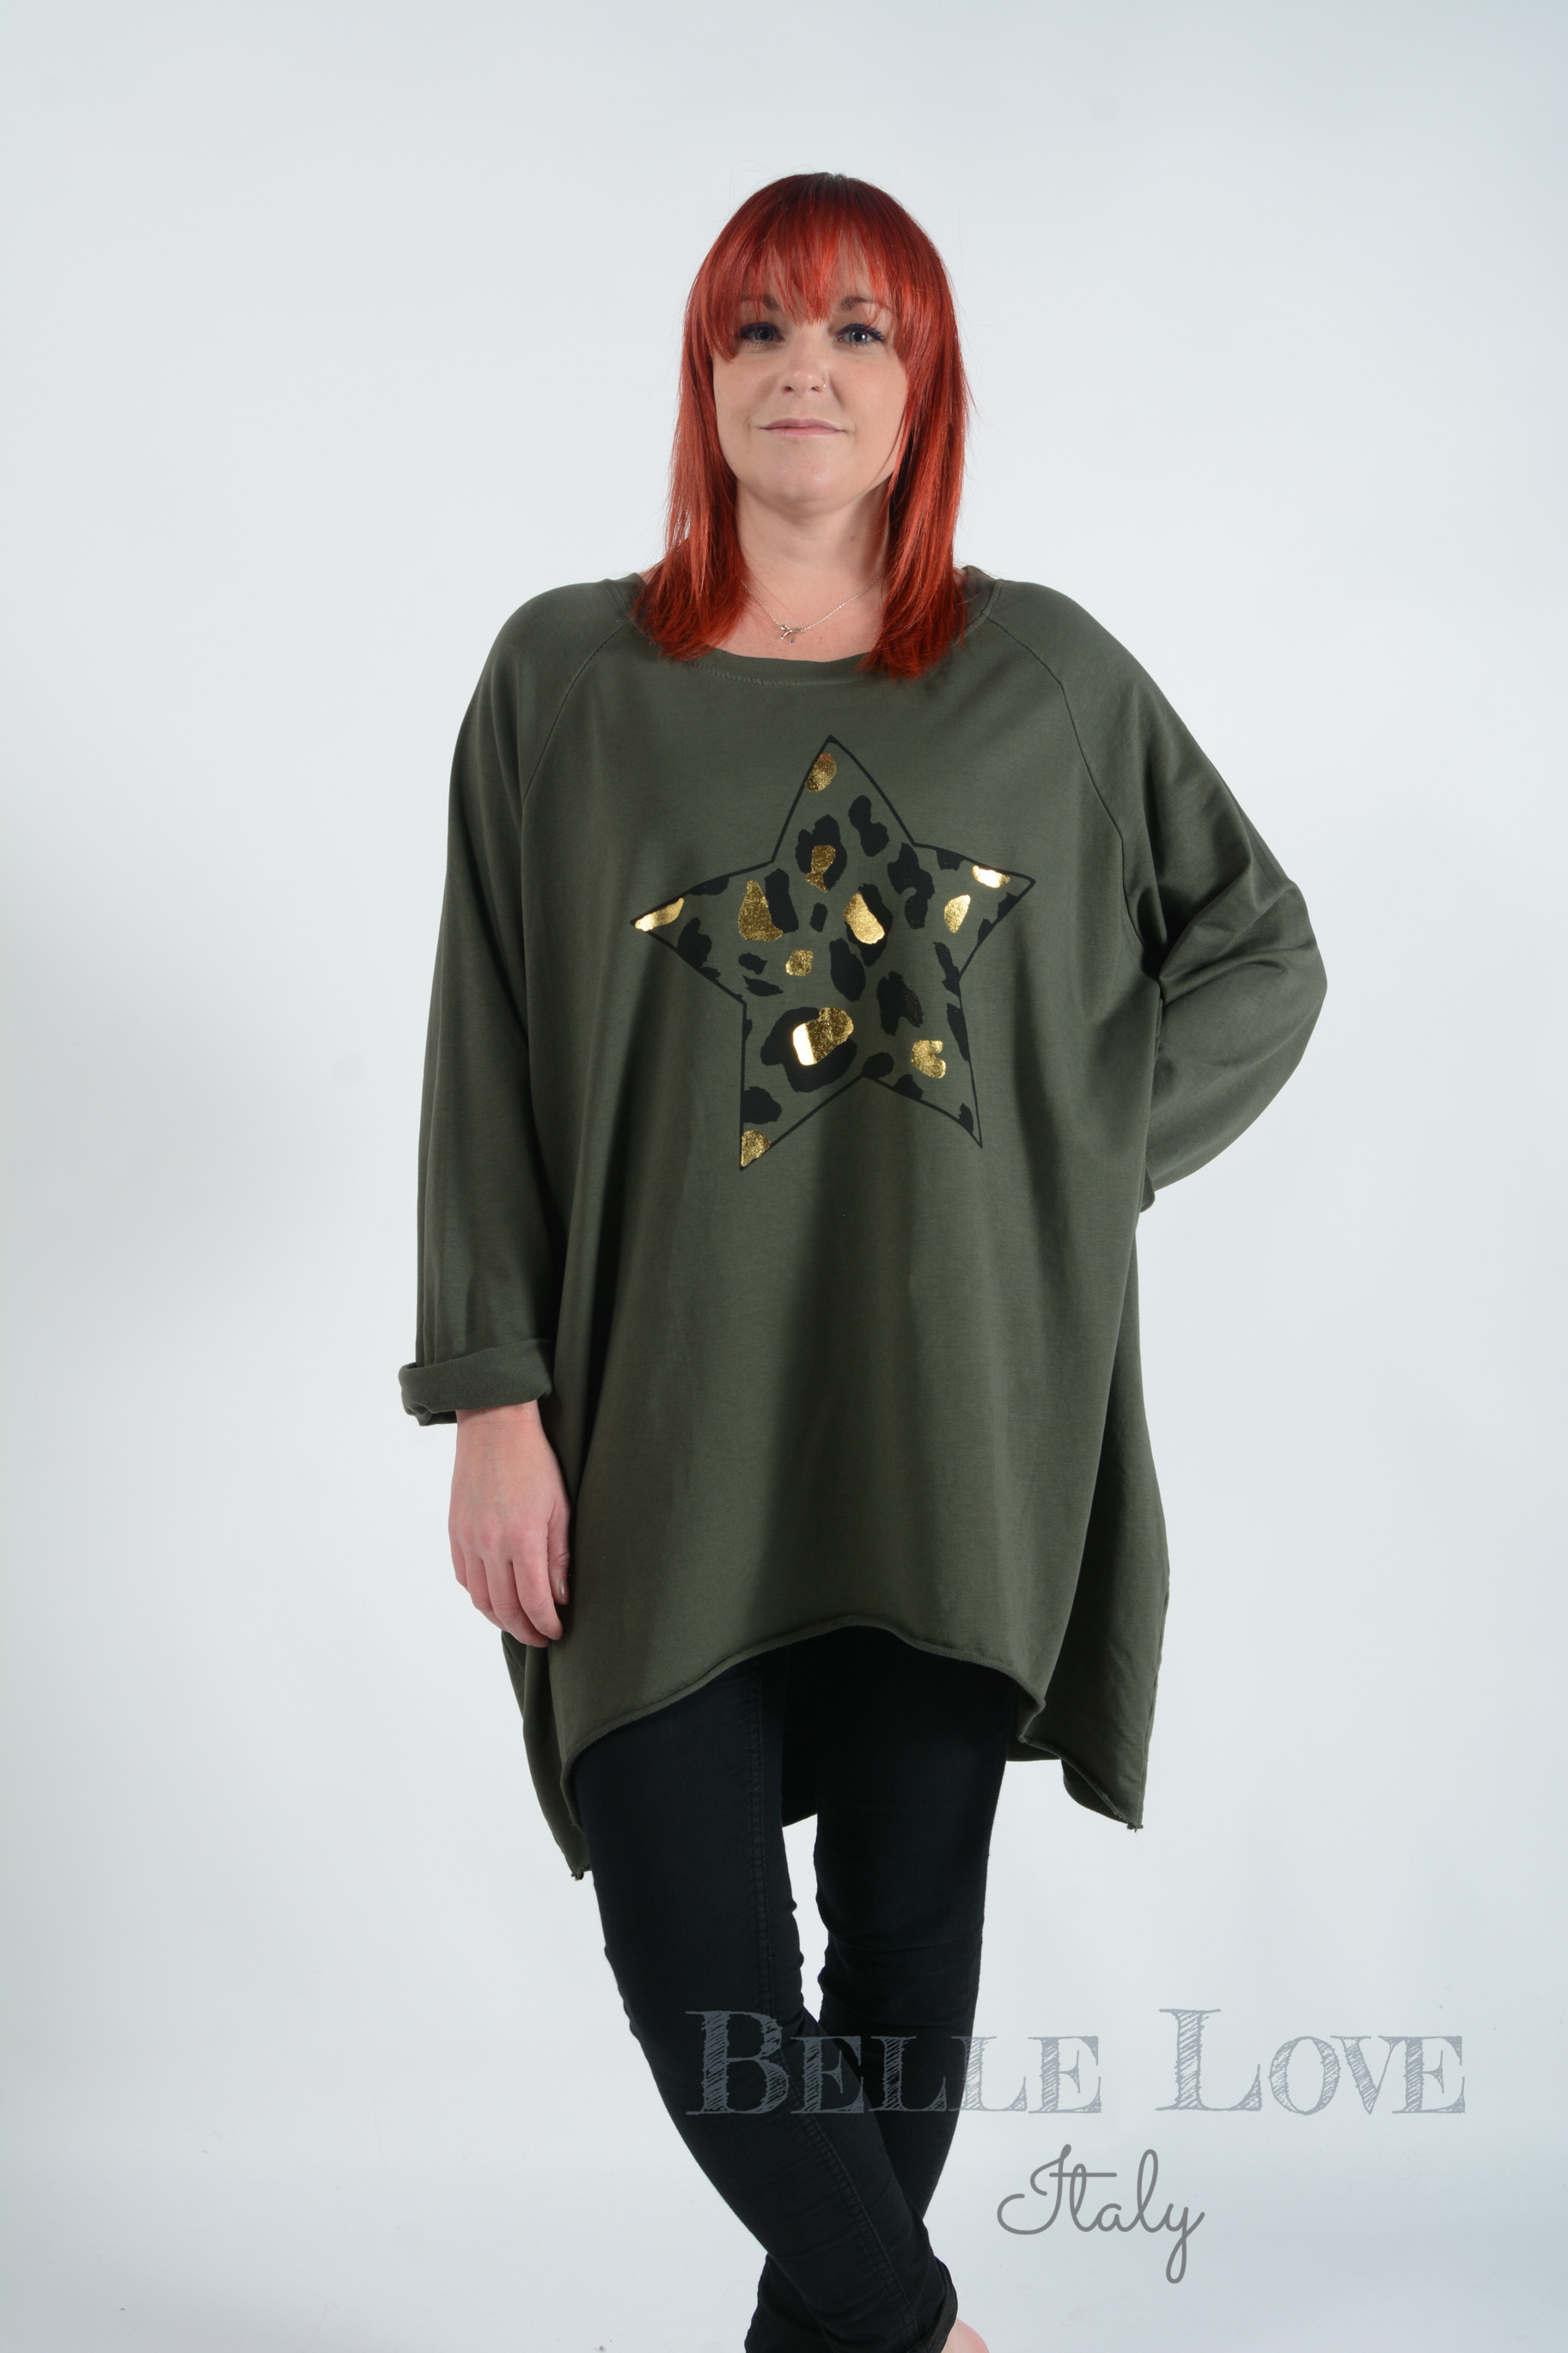 Belle Love Italy Luna Leopard Star Ladies Sweatshirt